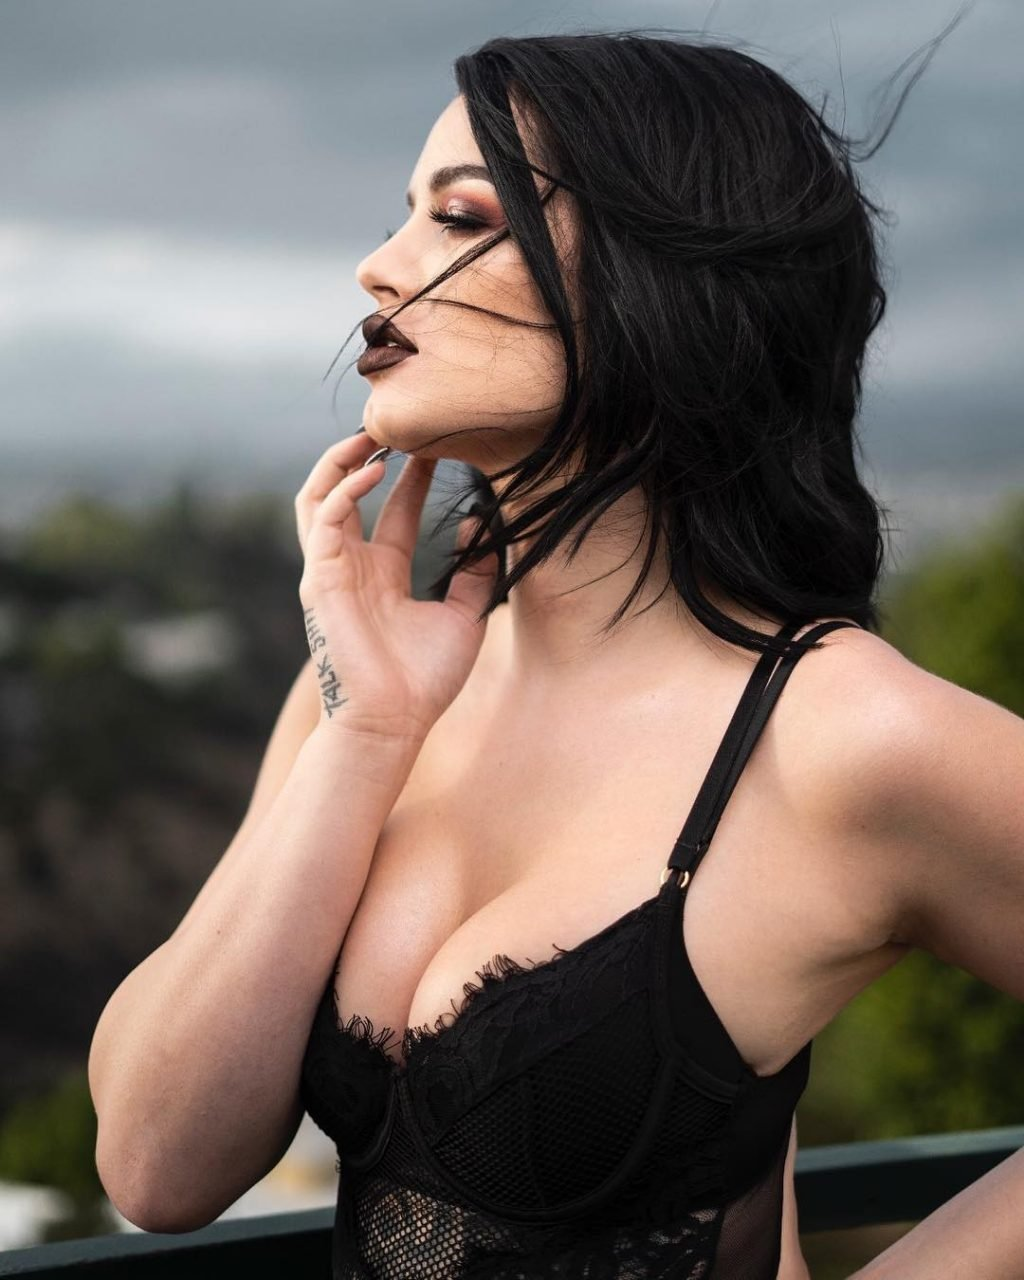 ex irish gf naked